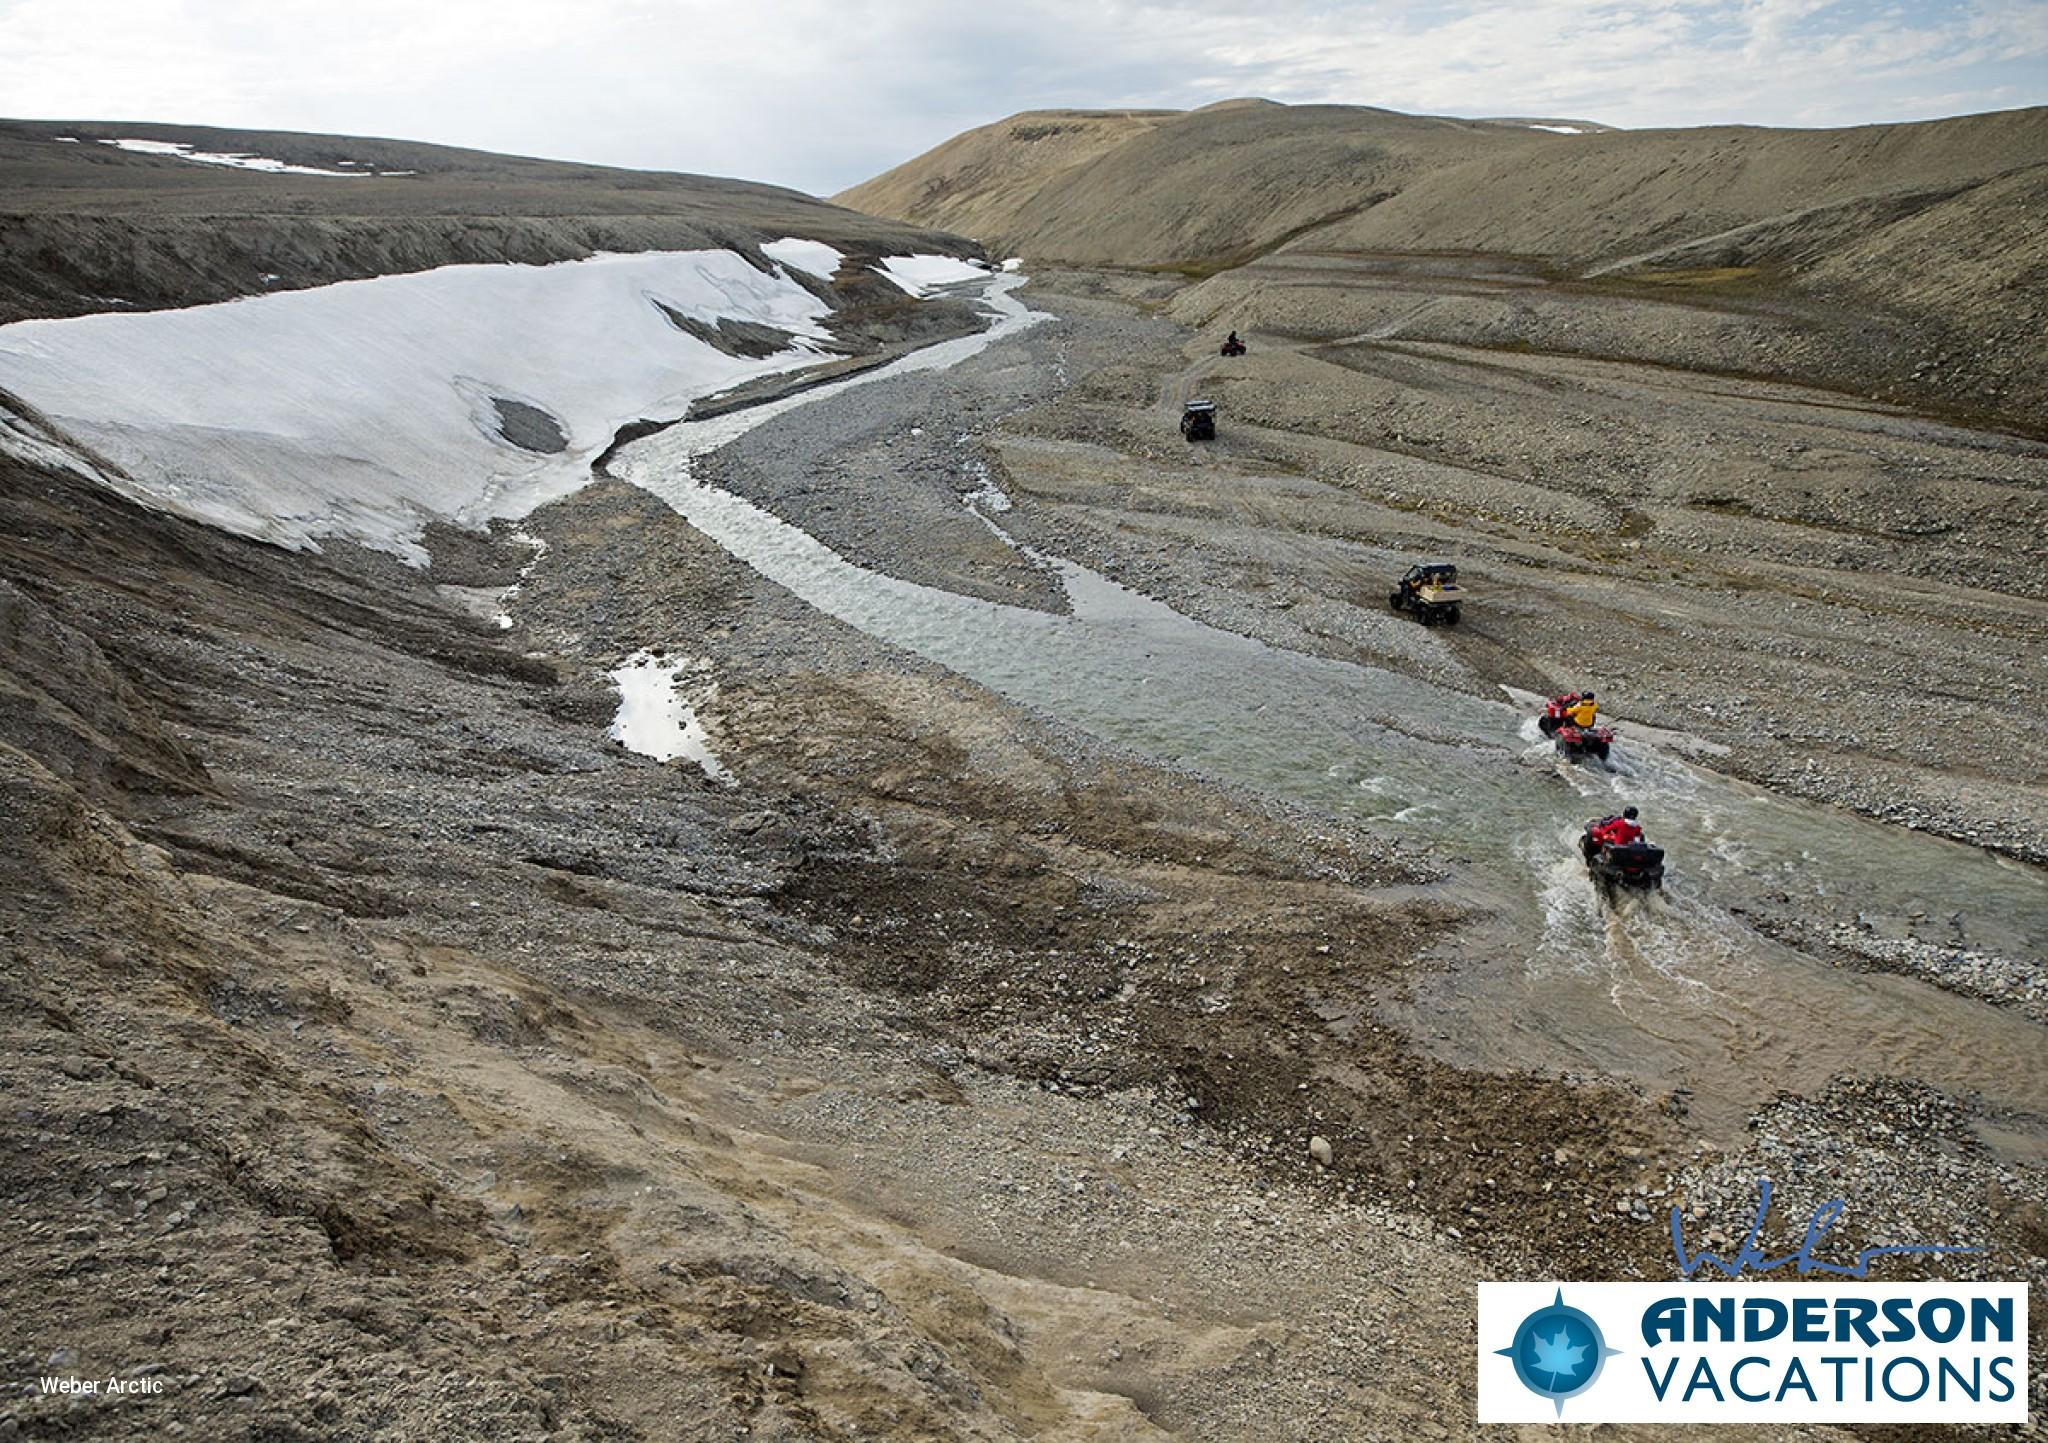 ATVing on the Tundra